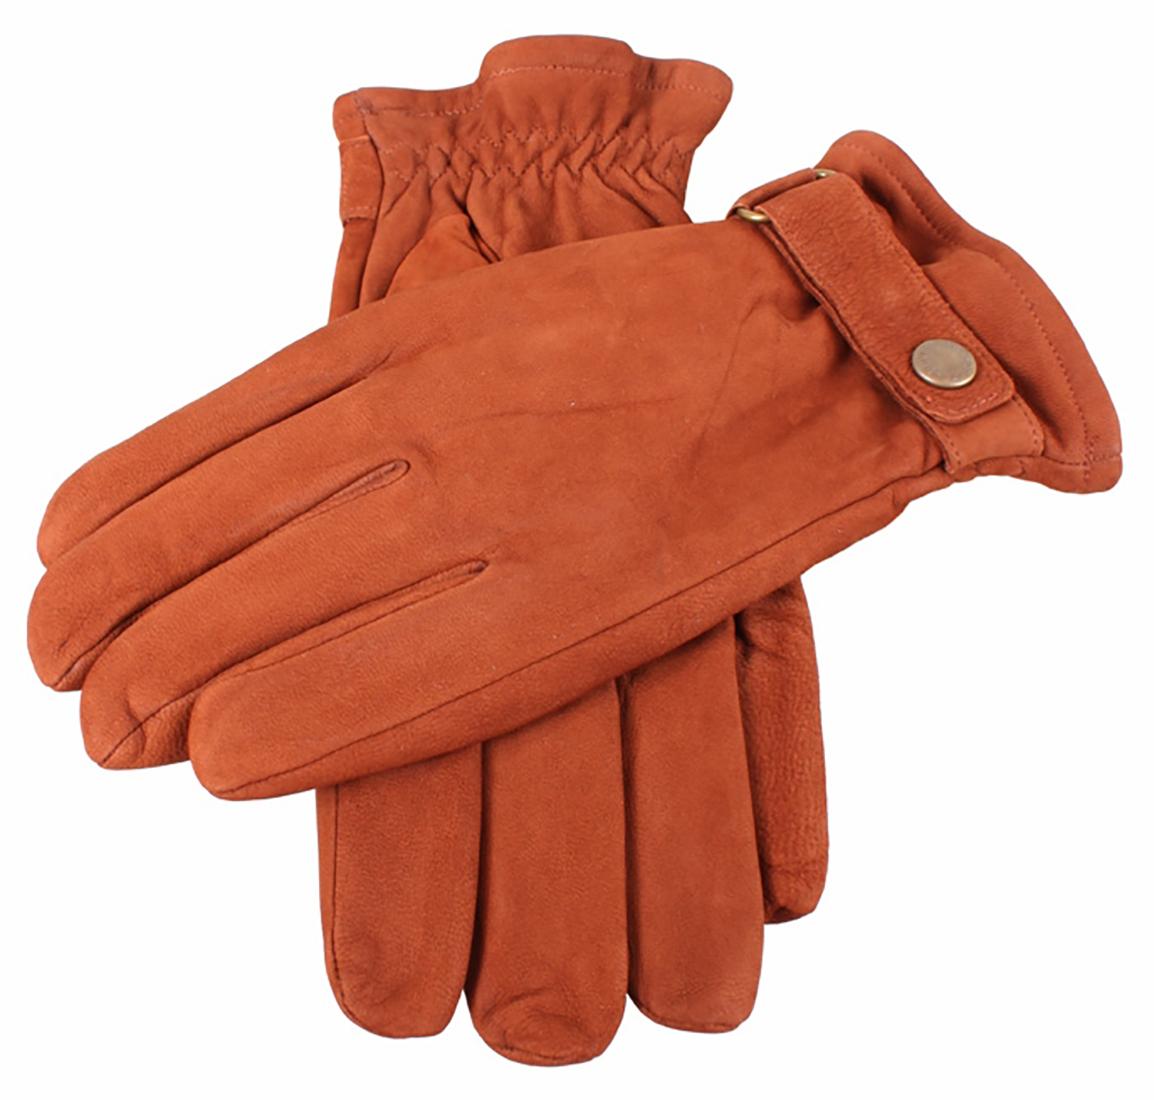 fcc7bac4 Dents nubuck leather gloves